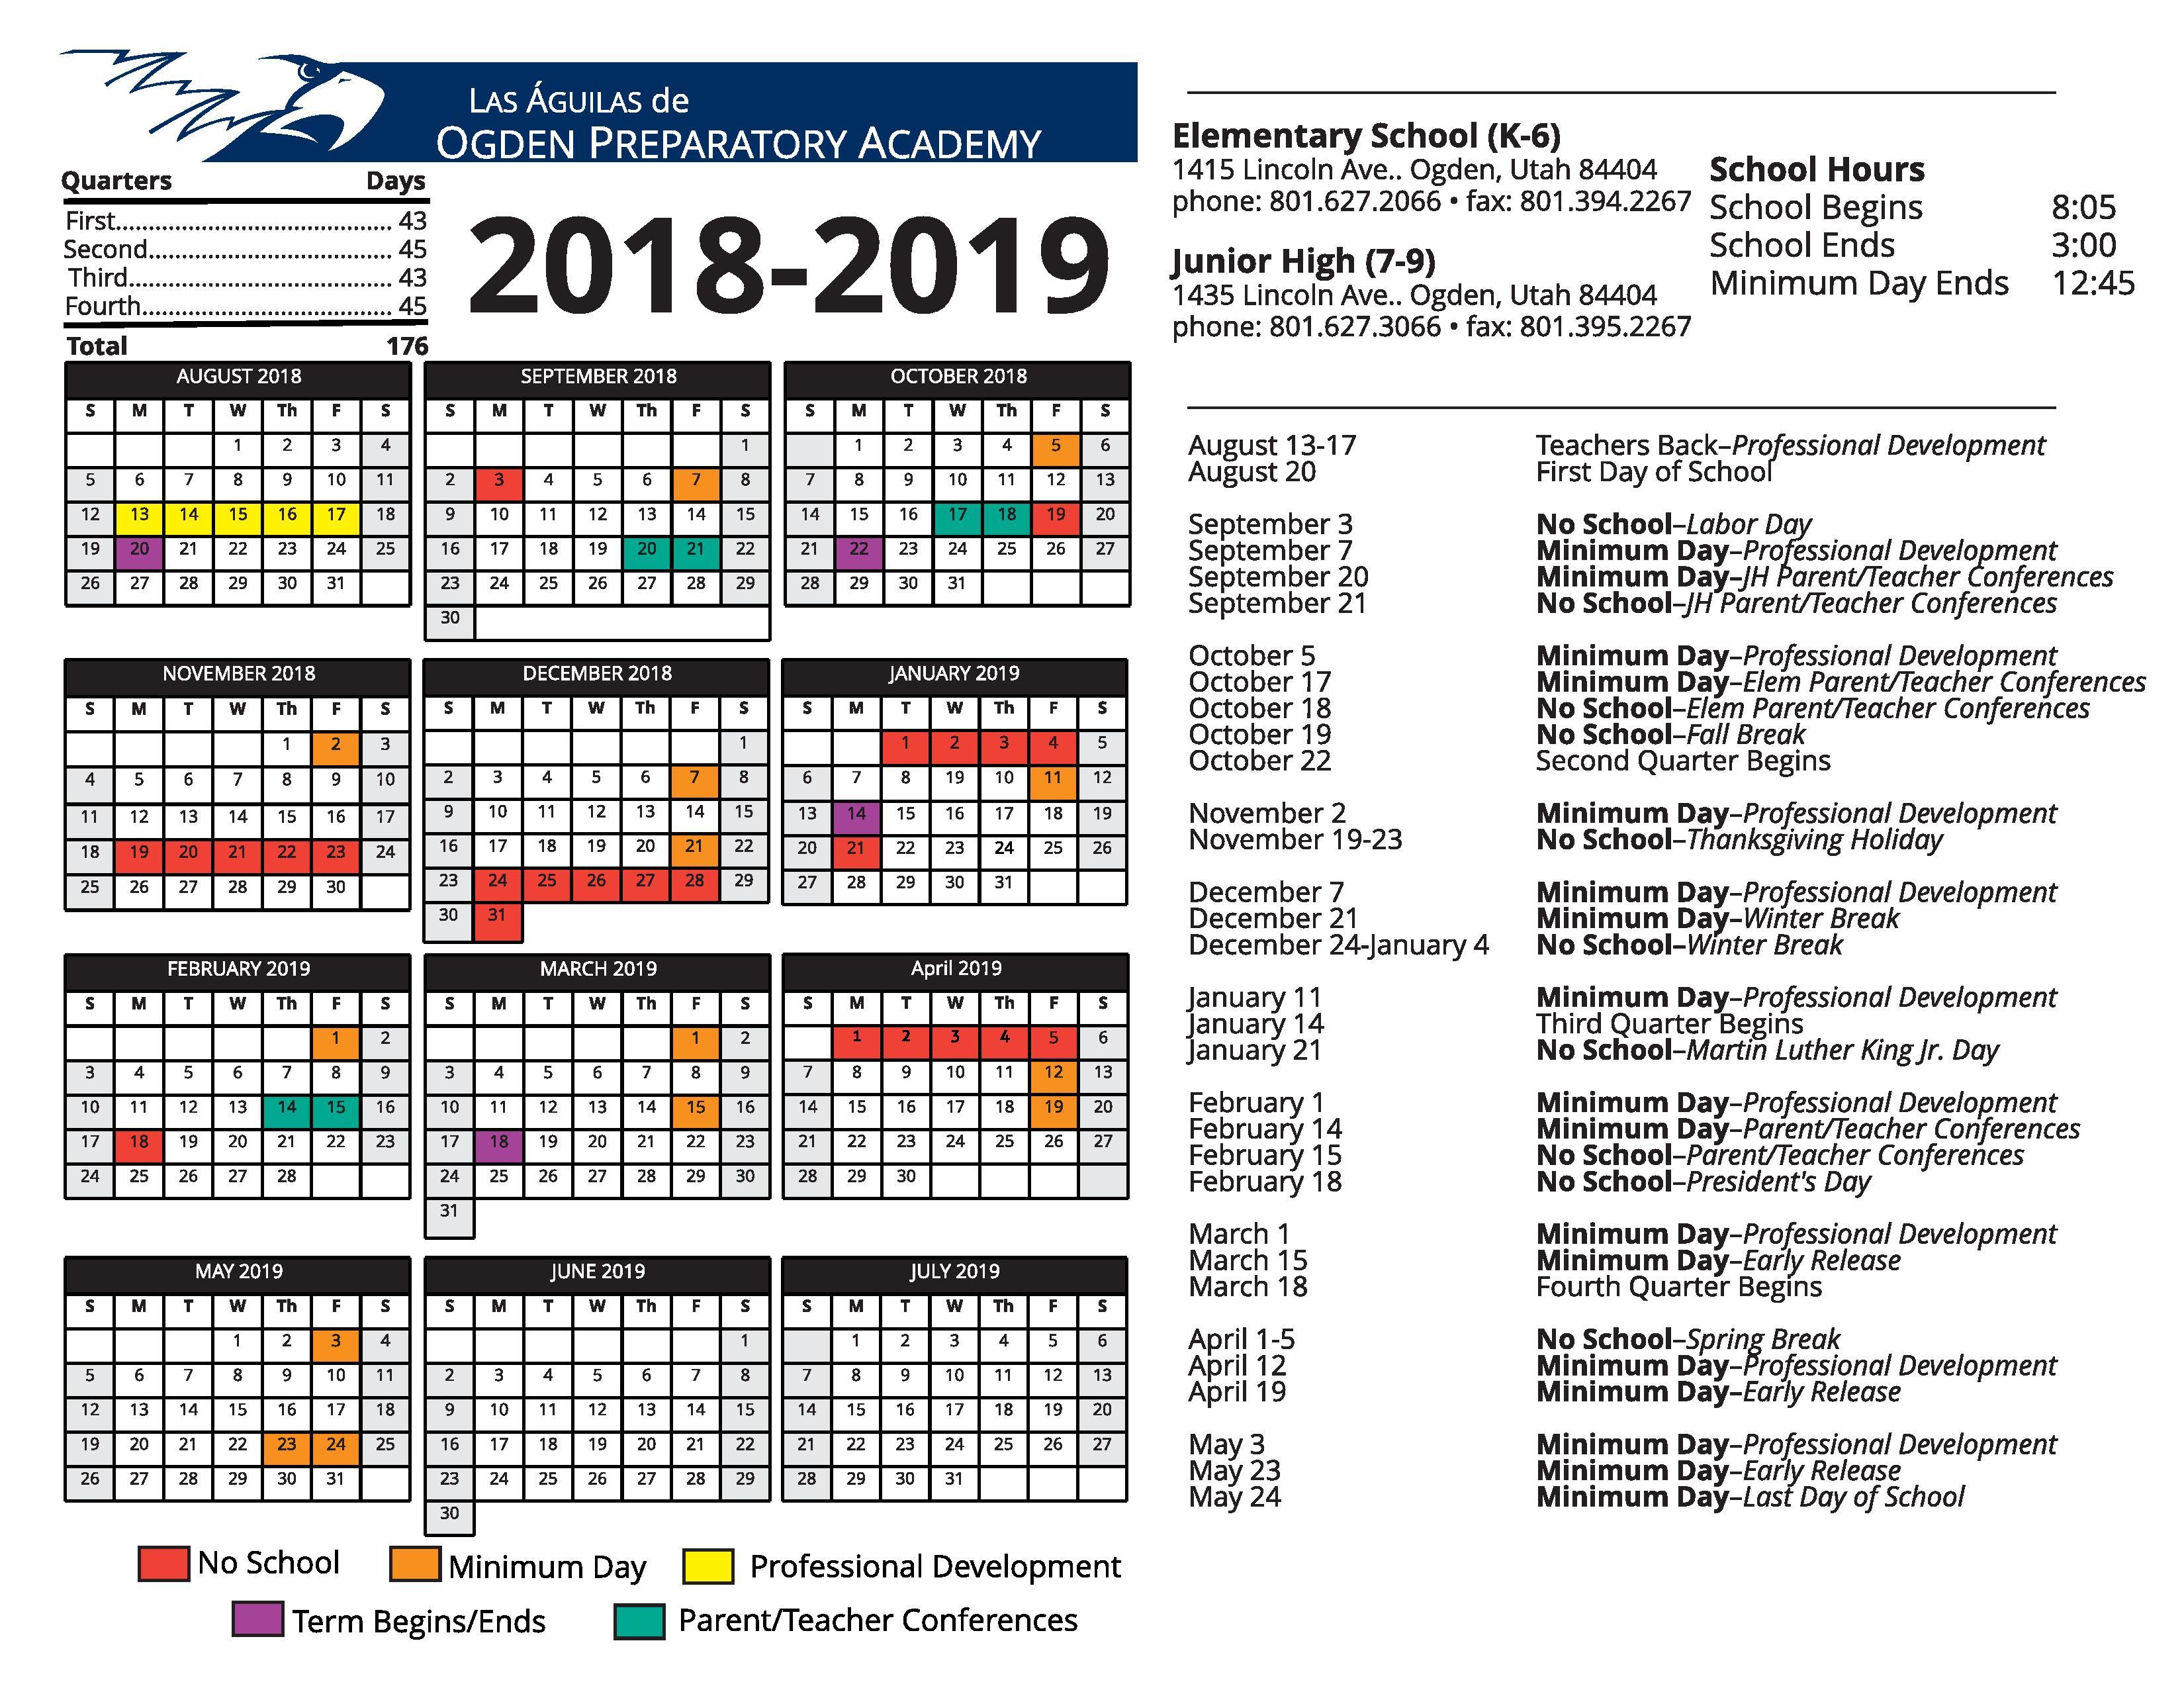 Elementary School Calendar